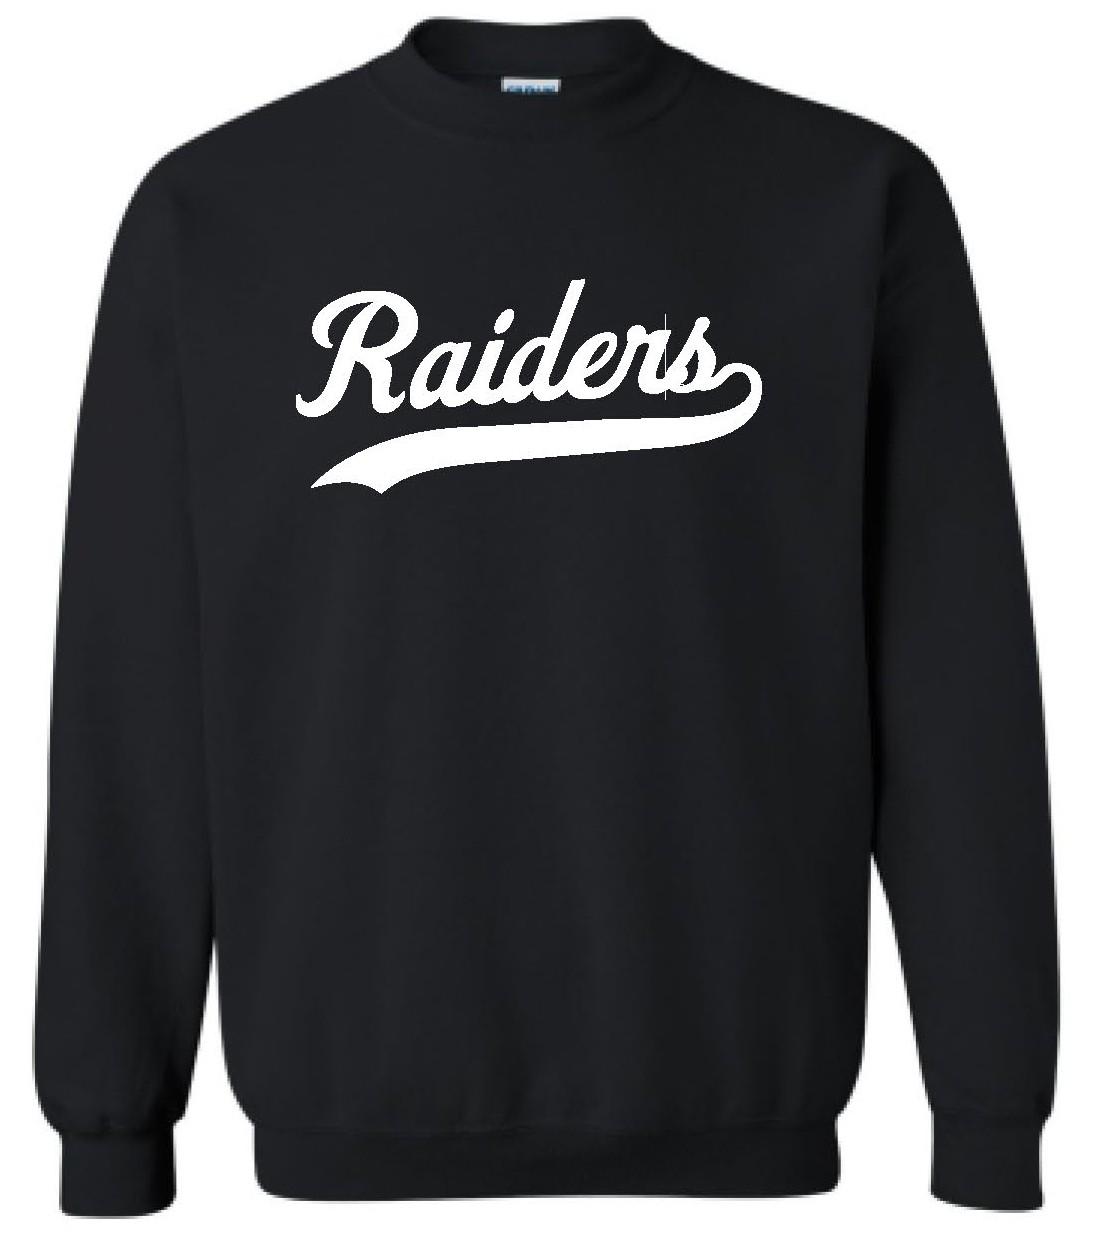 Raiders Gildan Heavy Blend Sweatshirt